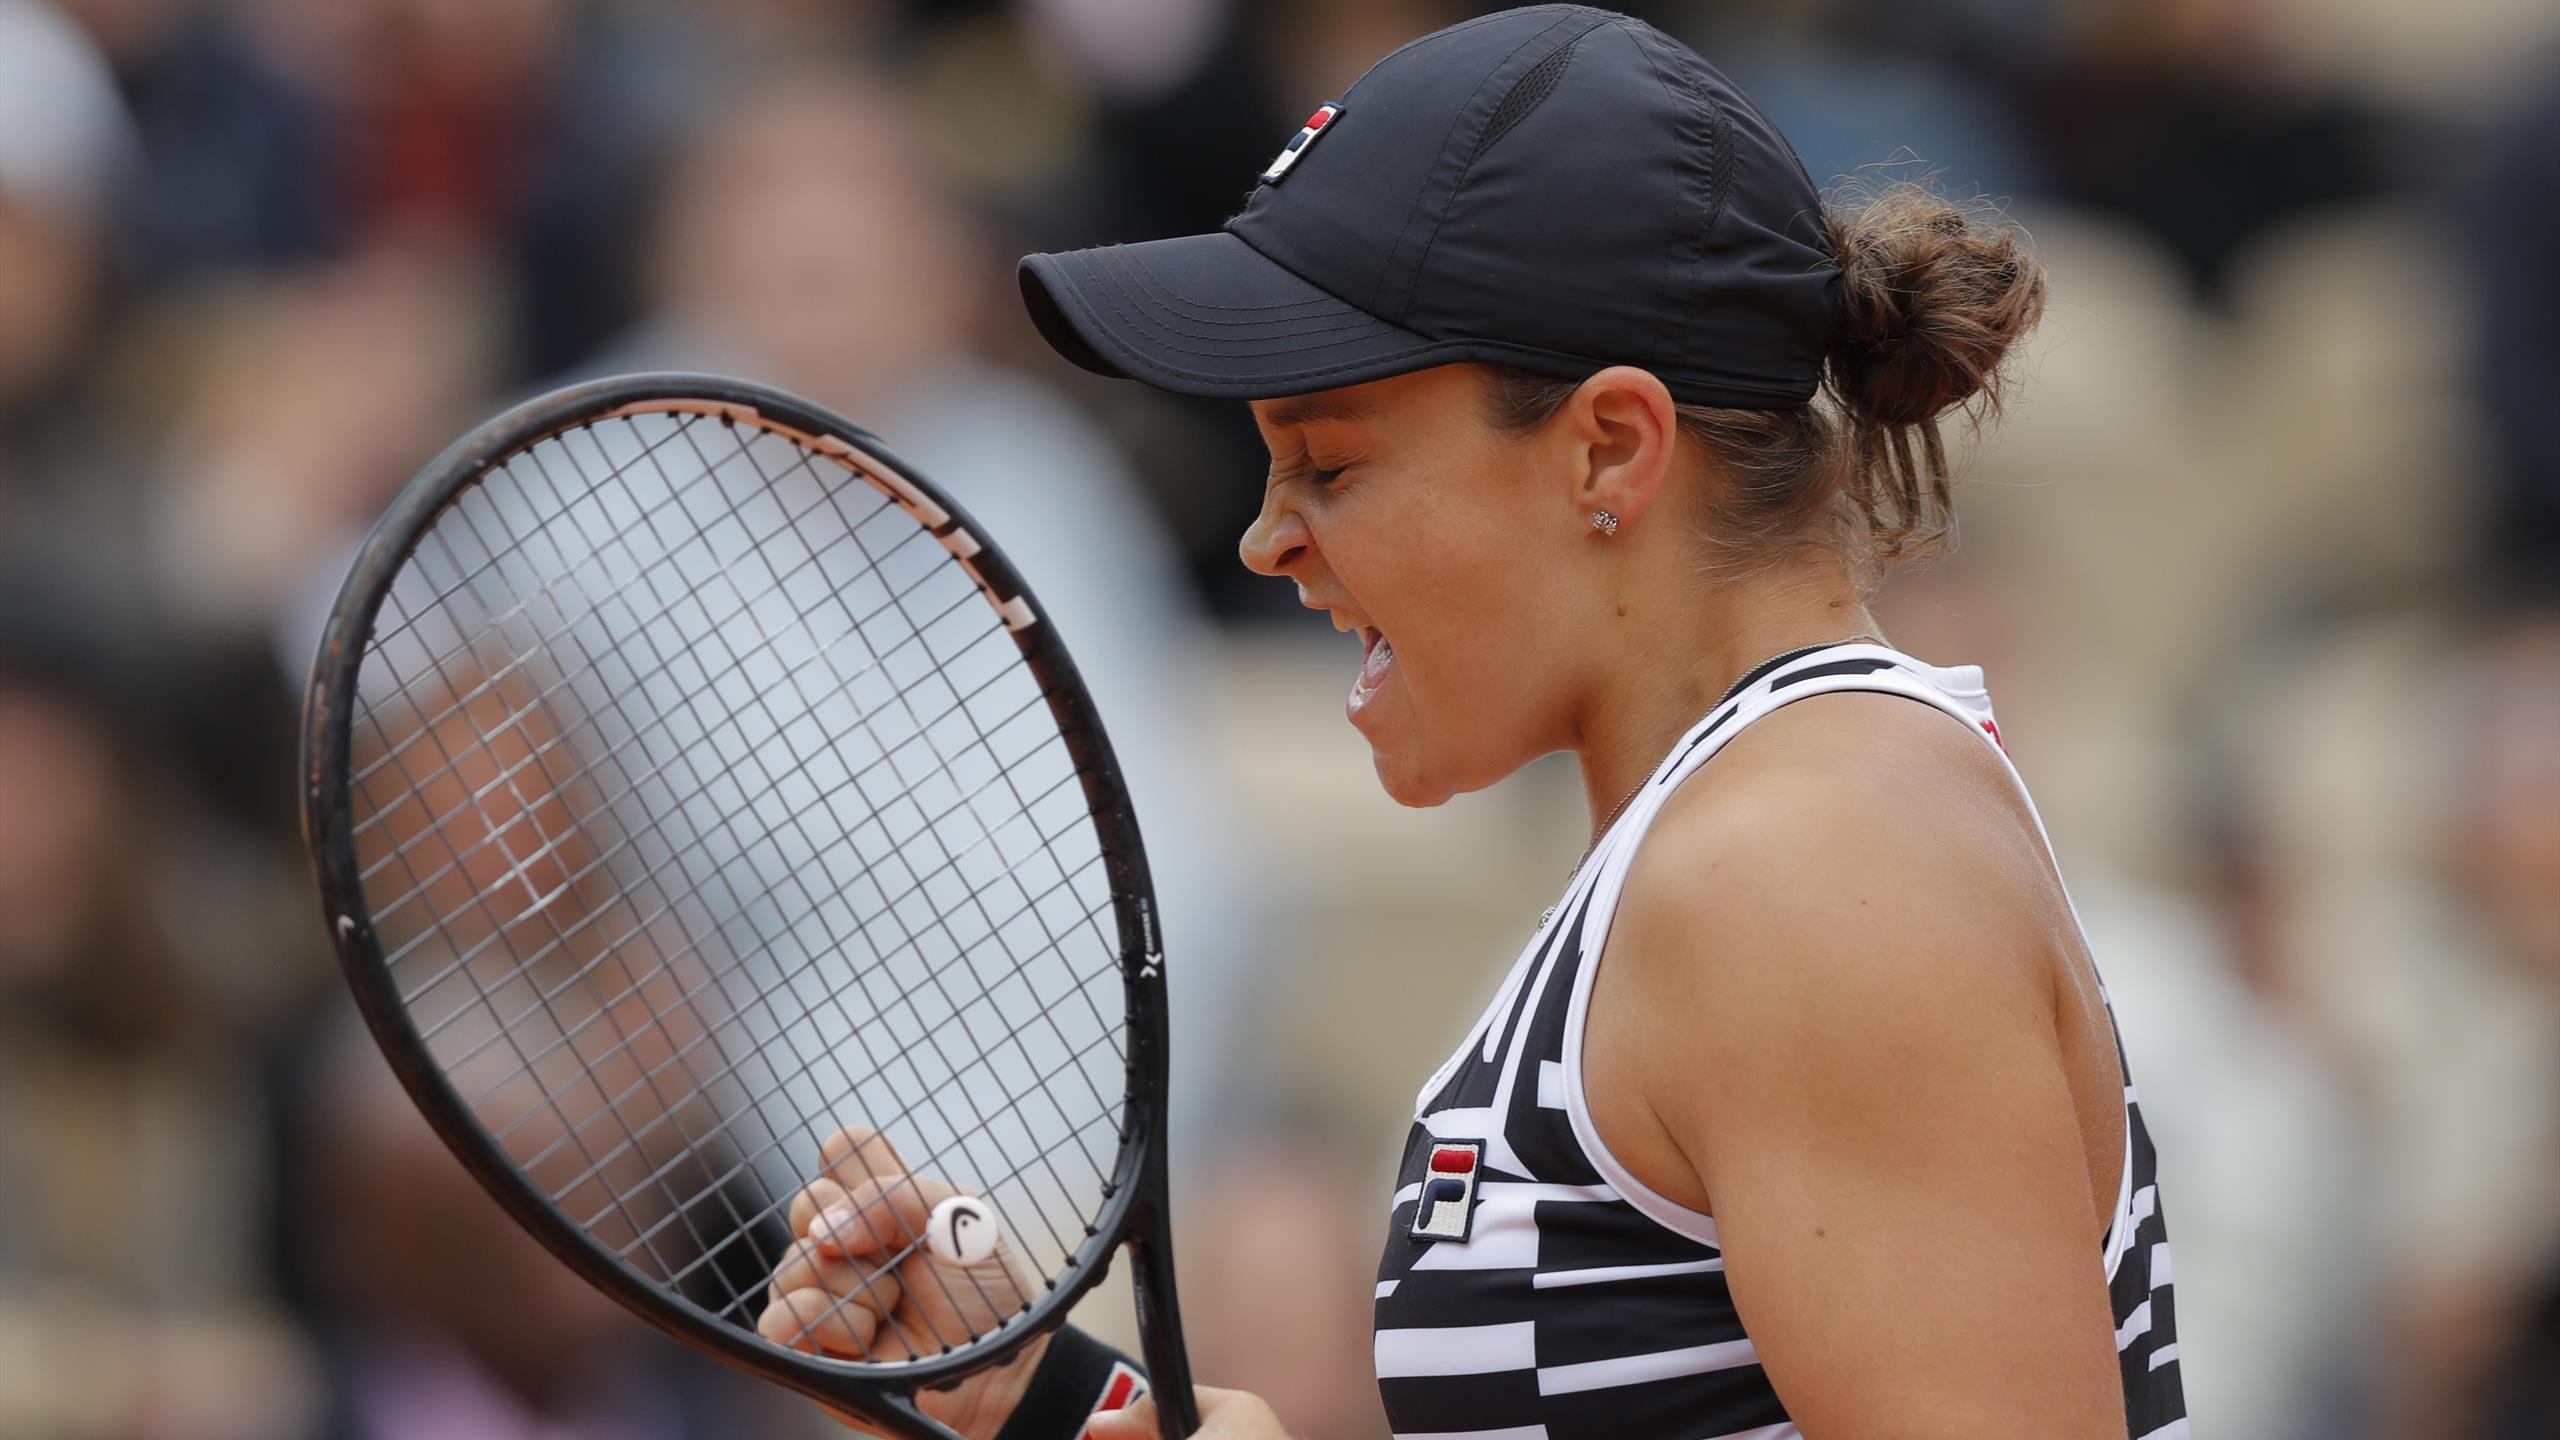 Ashleigh Barty S Parents To Miss French Open Final Despite Late Paris Dash Eurosport